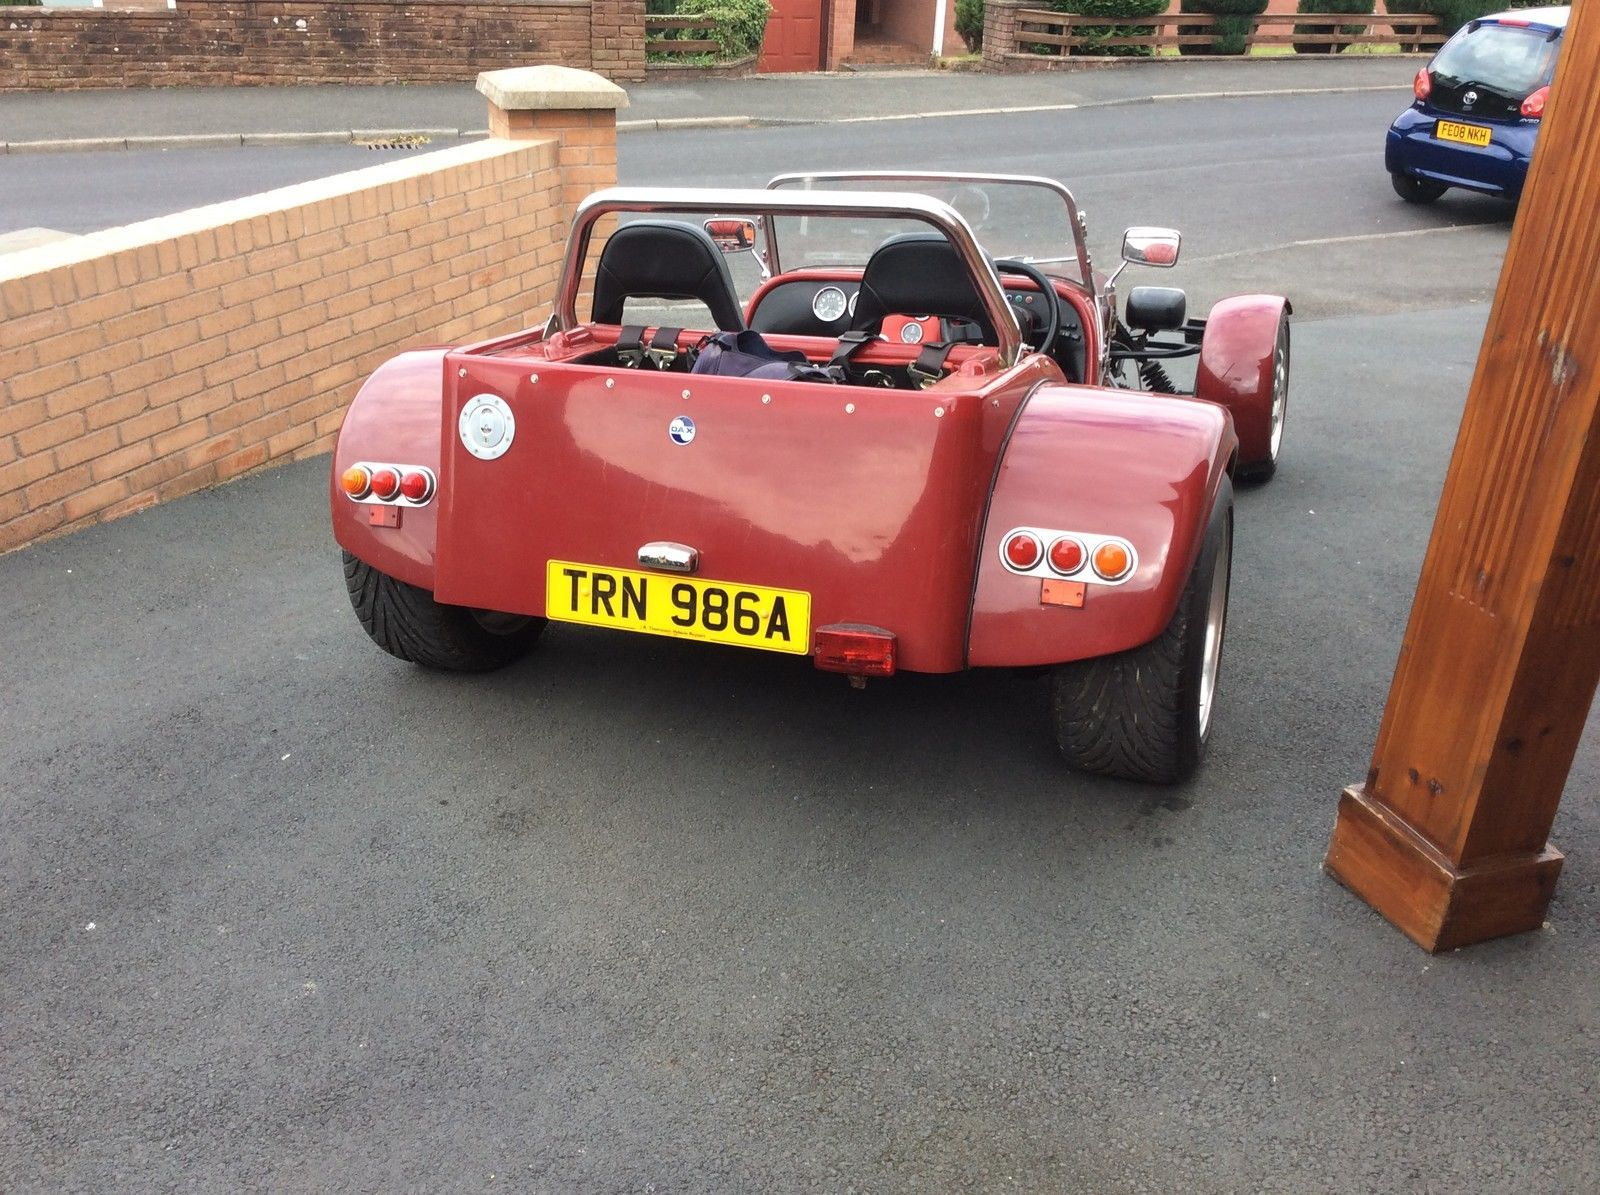 Lotus 7 kit car usa - Dax Rush Kit Car Trn 986a Kit Carslotus 7motors